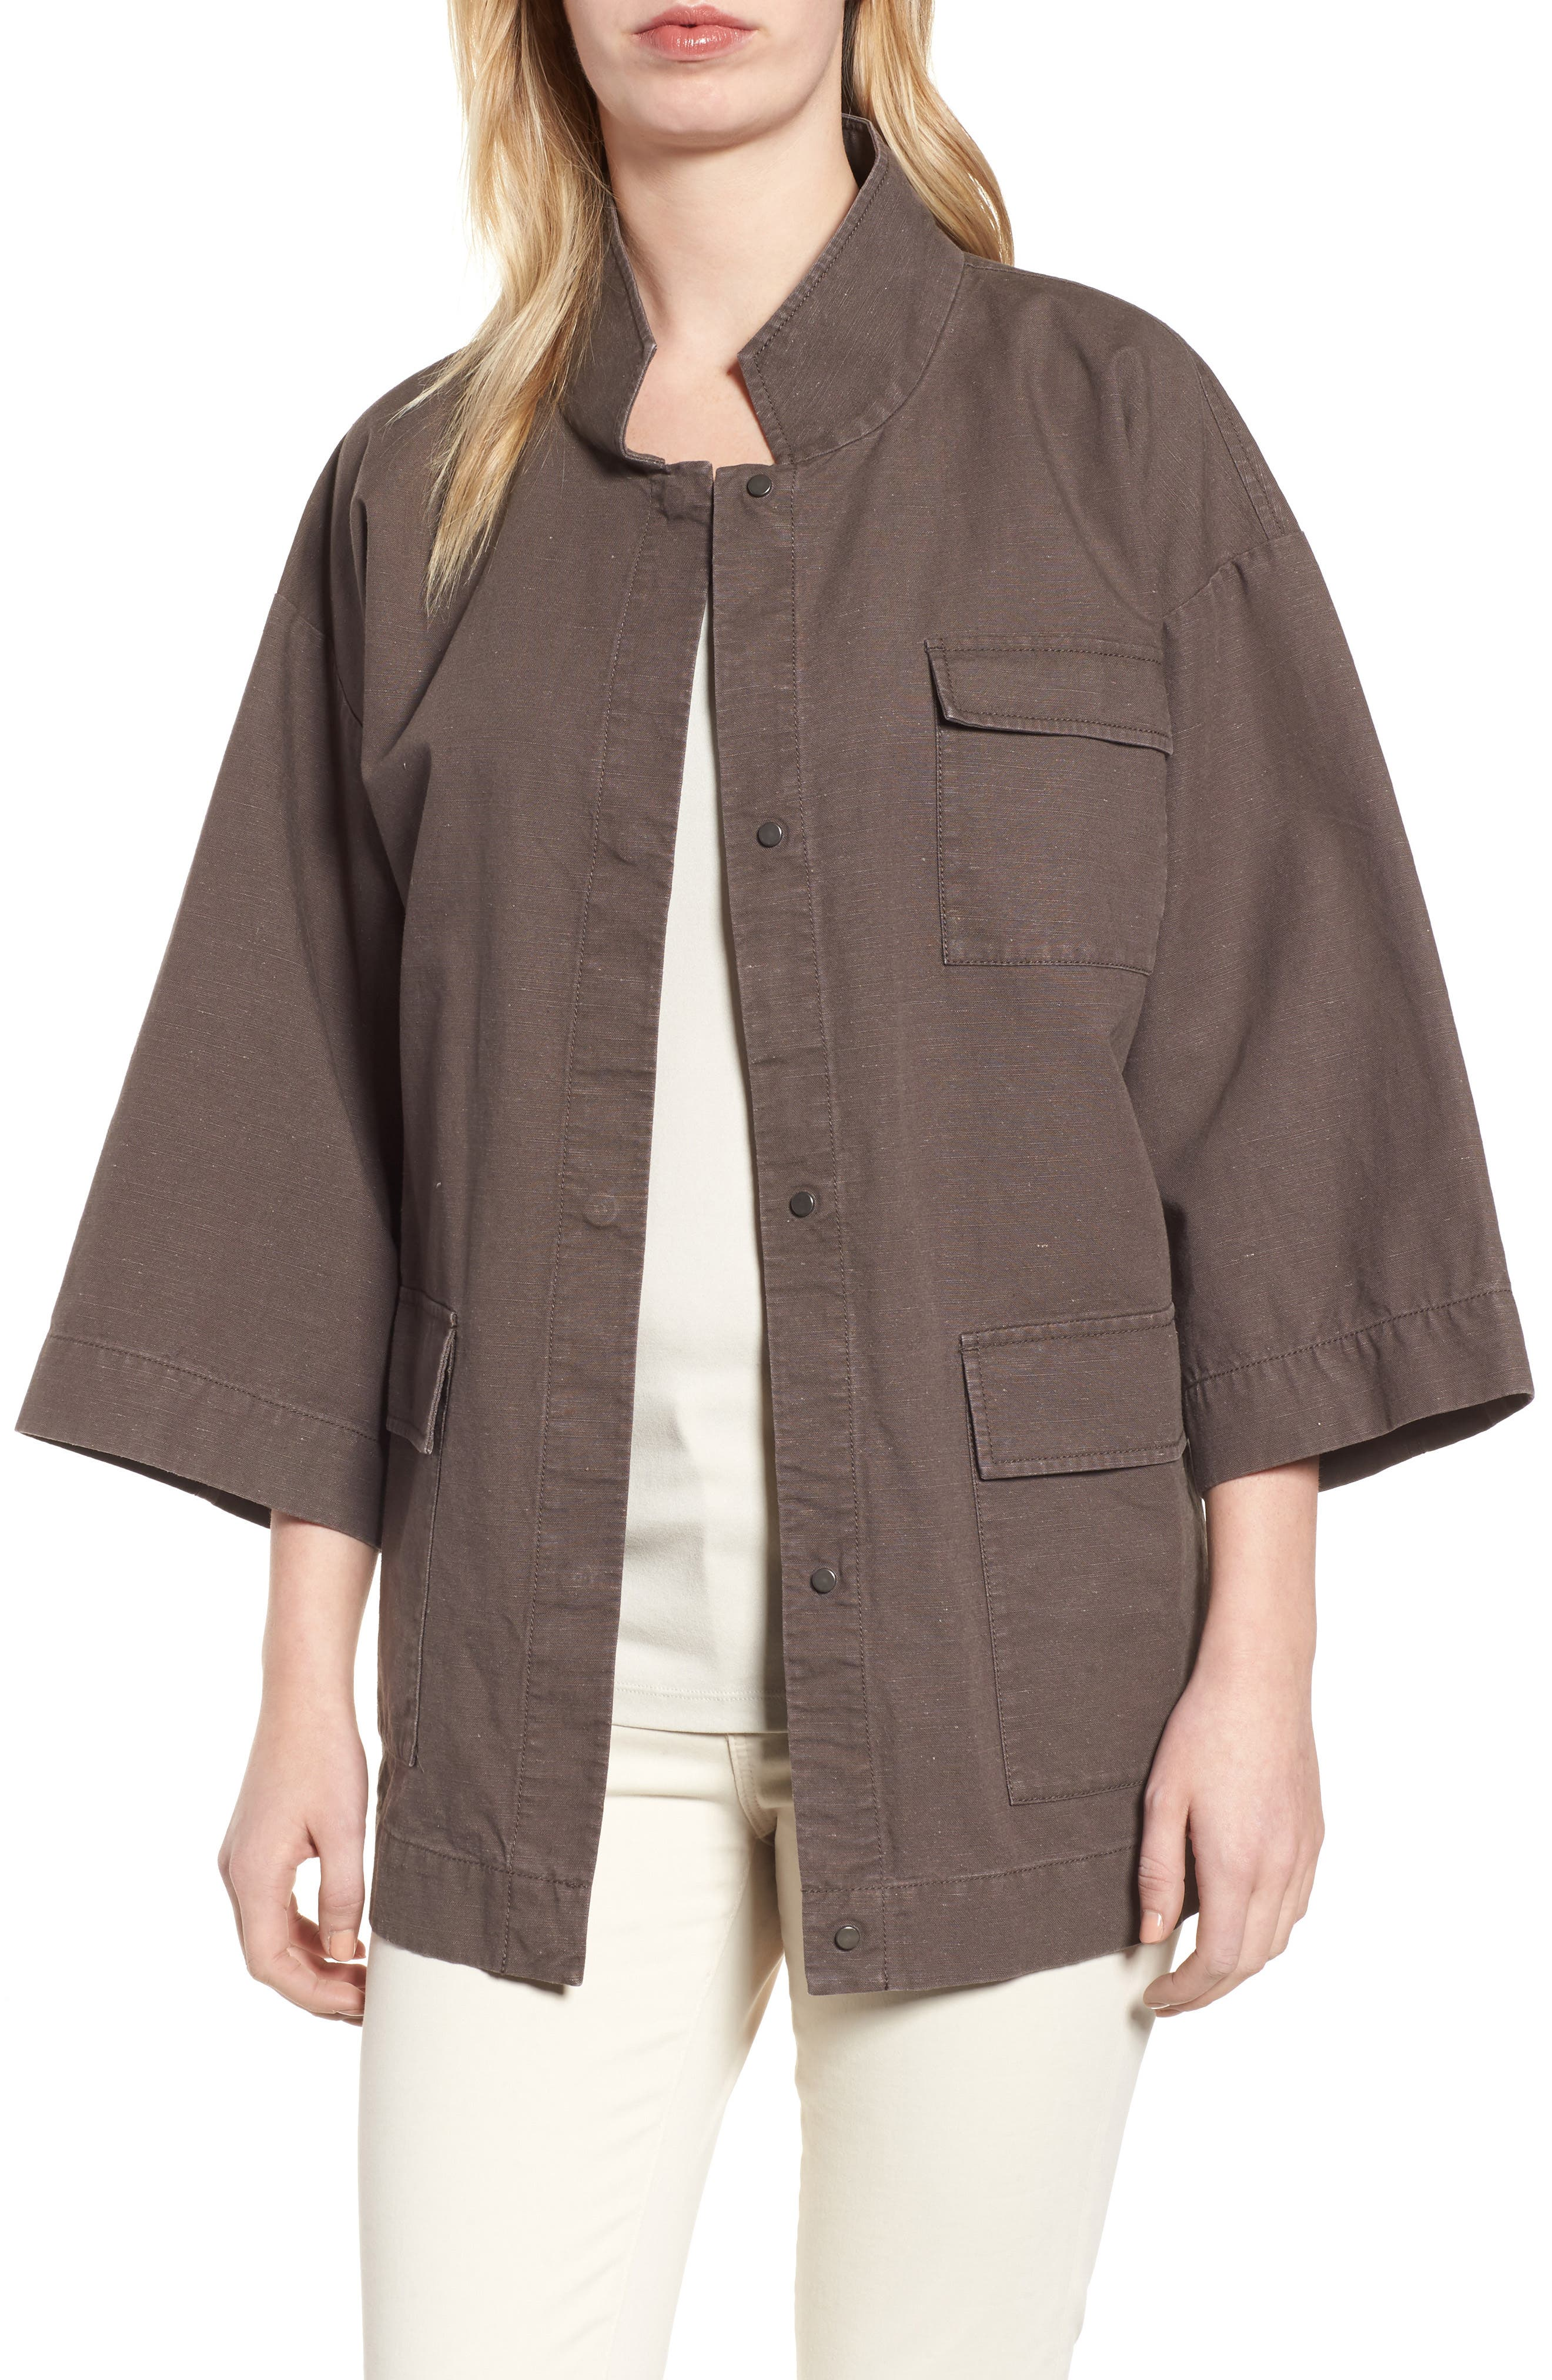 Organic Cotton & Hemp Jacket,                         Main,                         color, 024